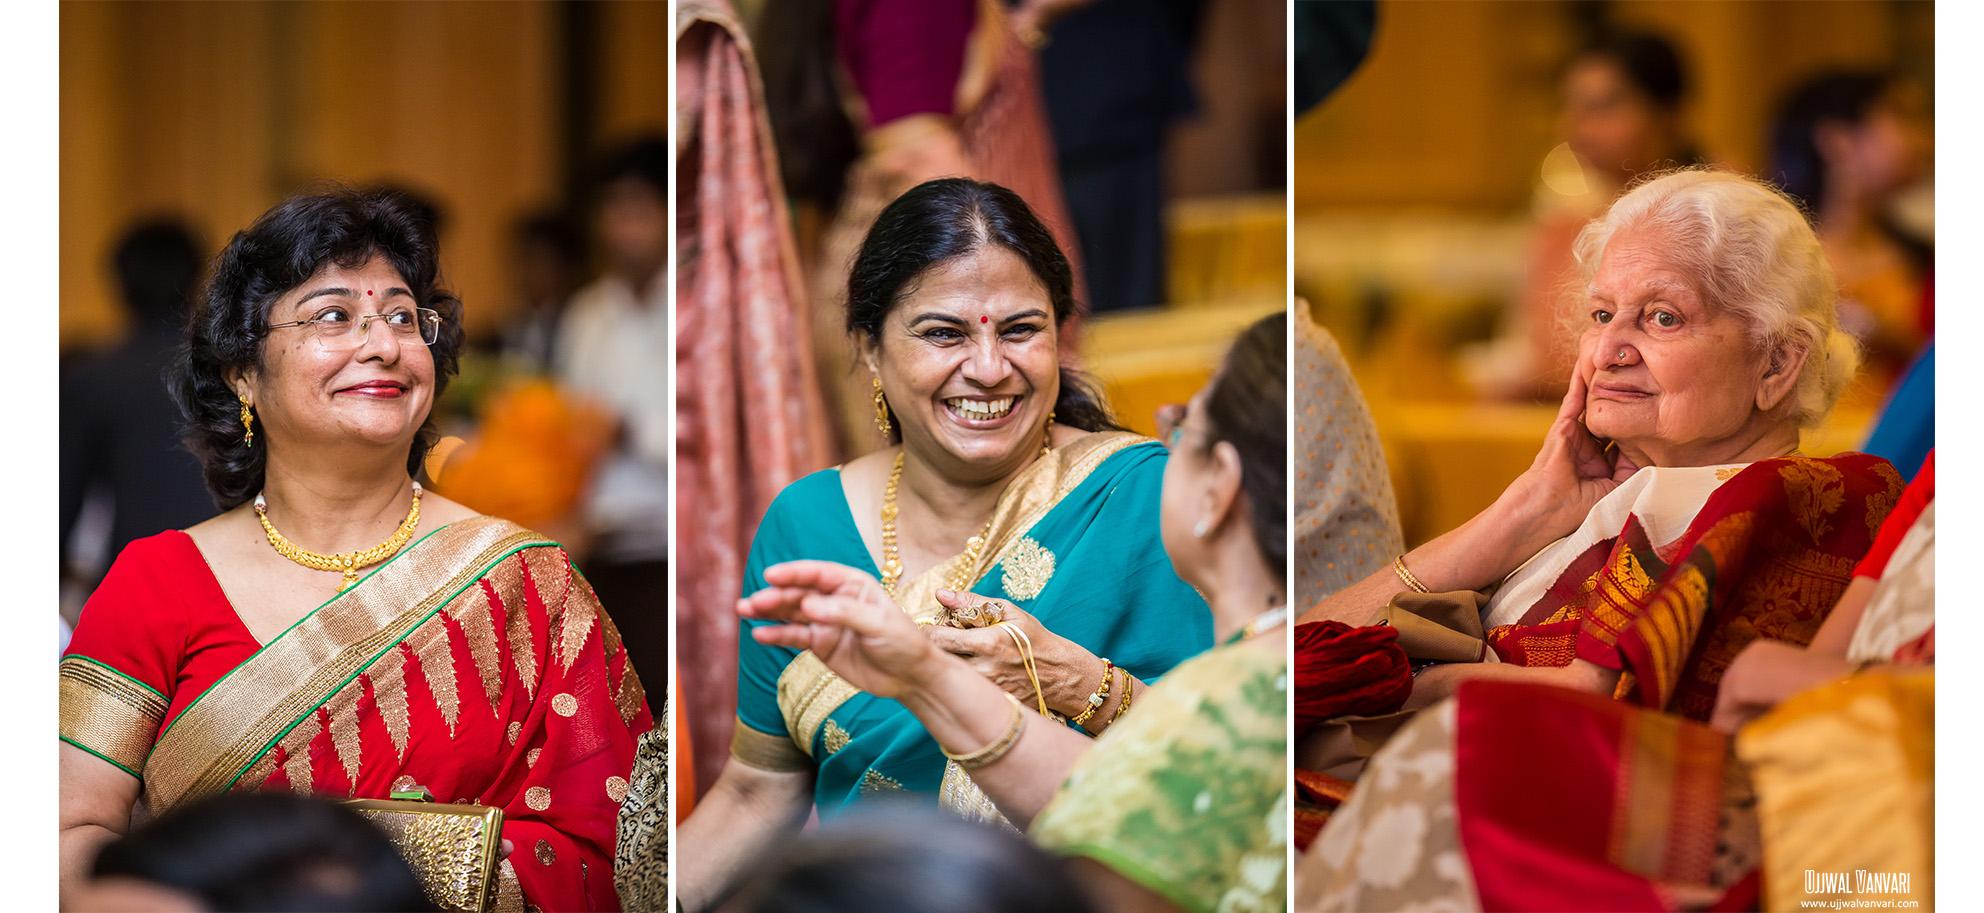 Lucknow Wedding Photography | Mannat & Risbhabh Lucknow Wedding | Candid Wedding Photography